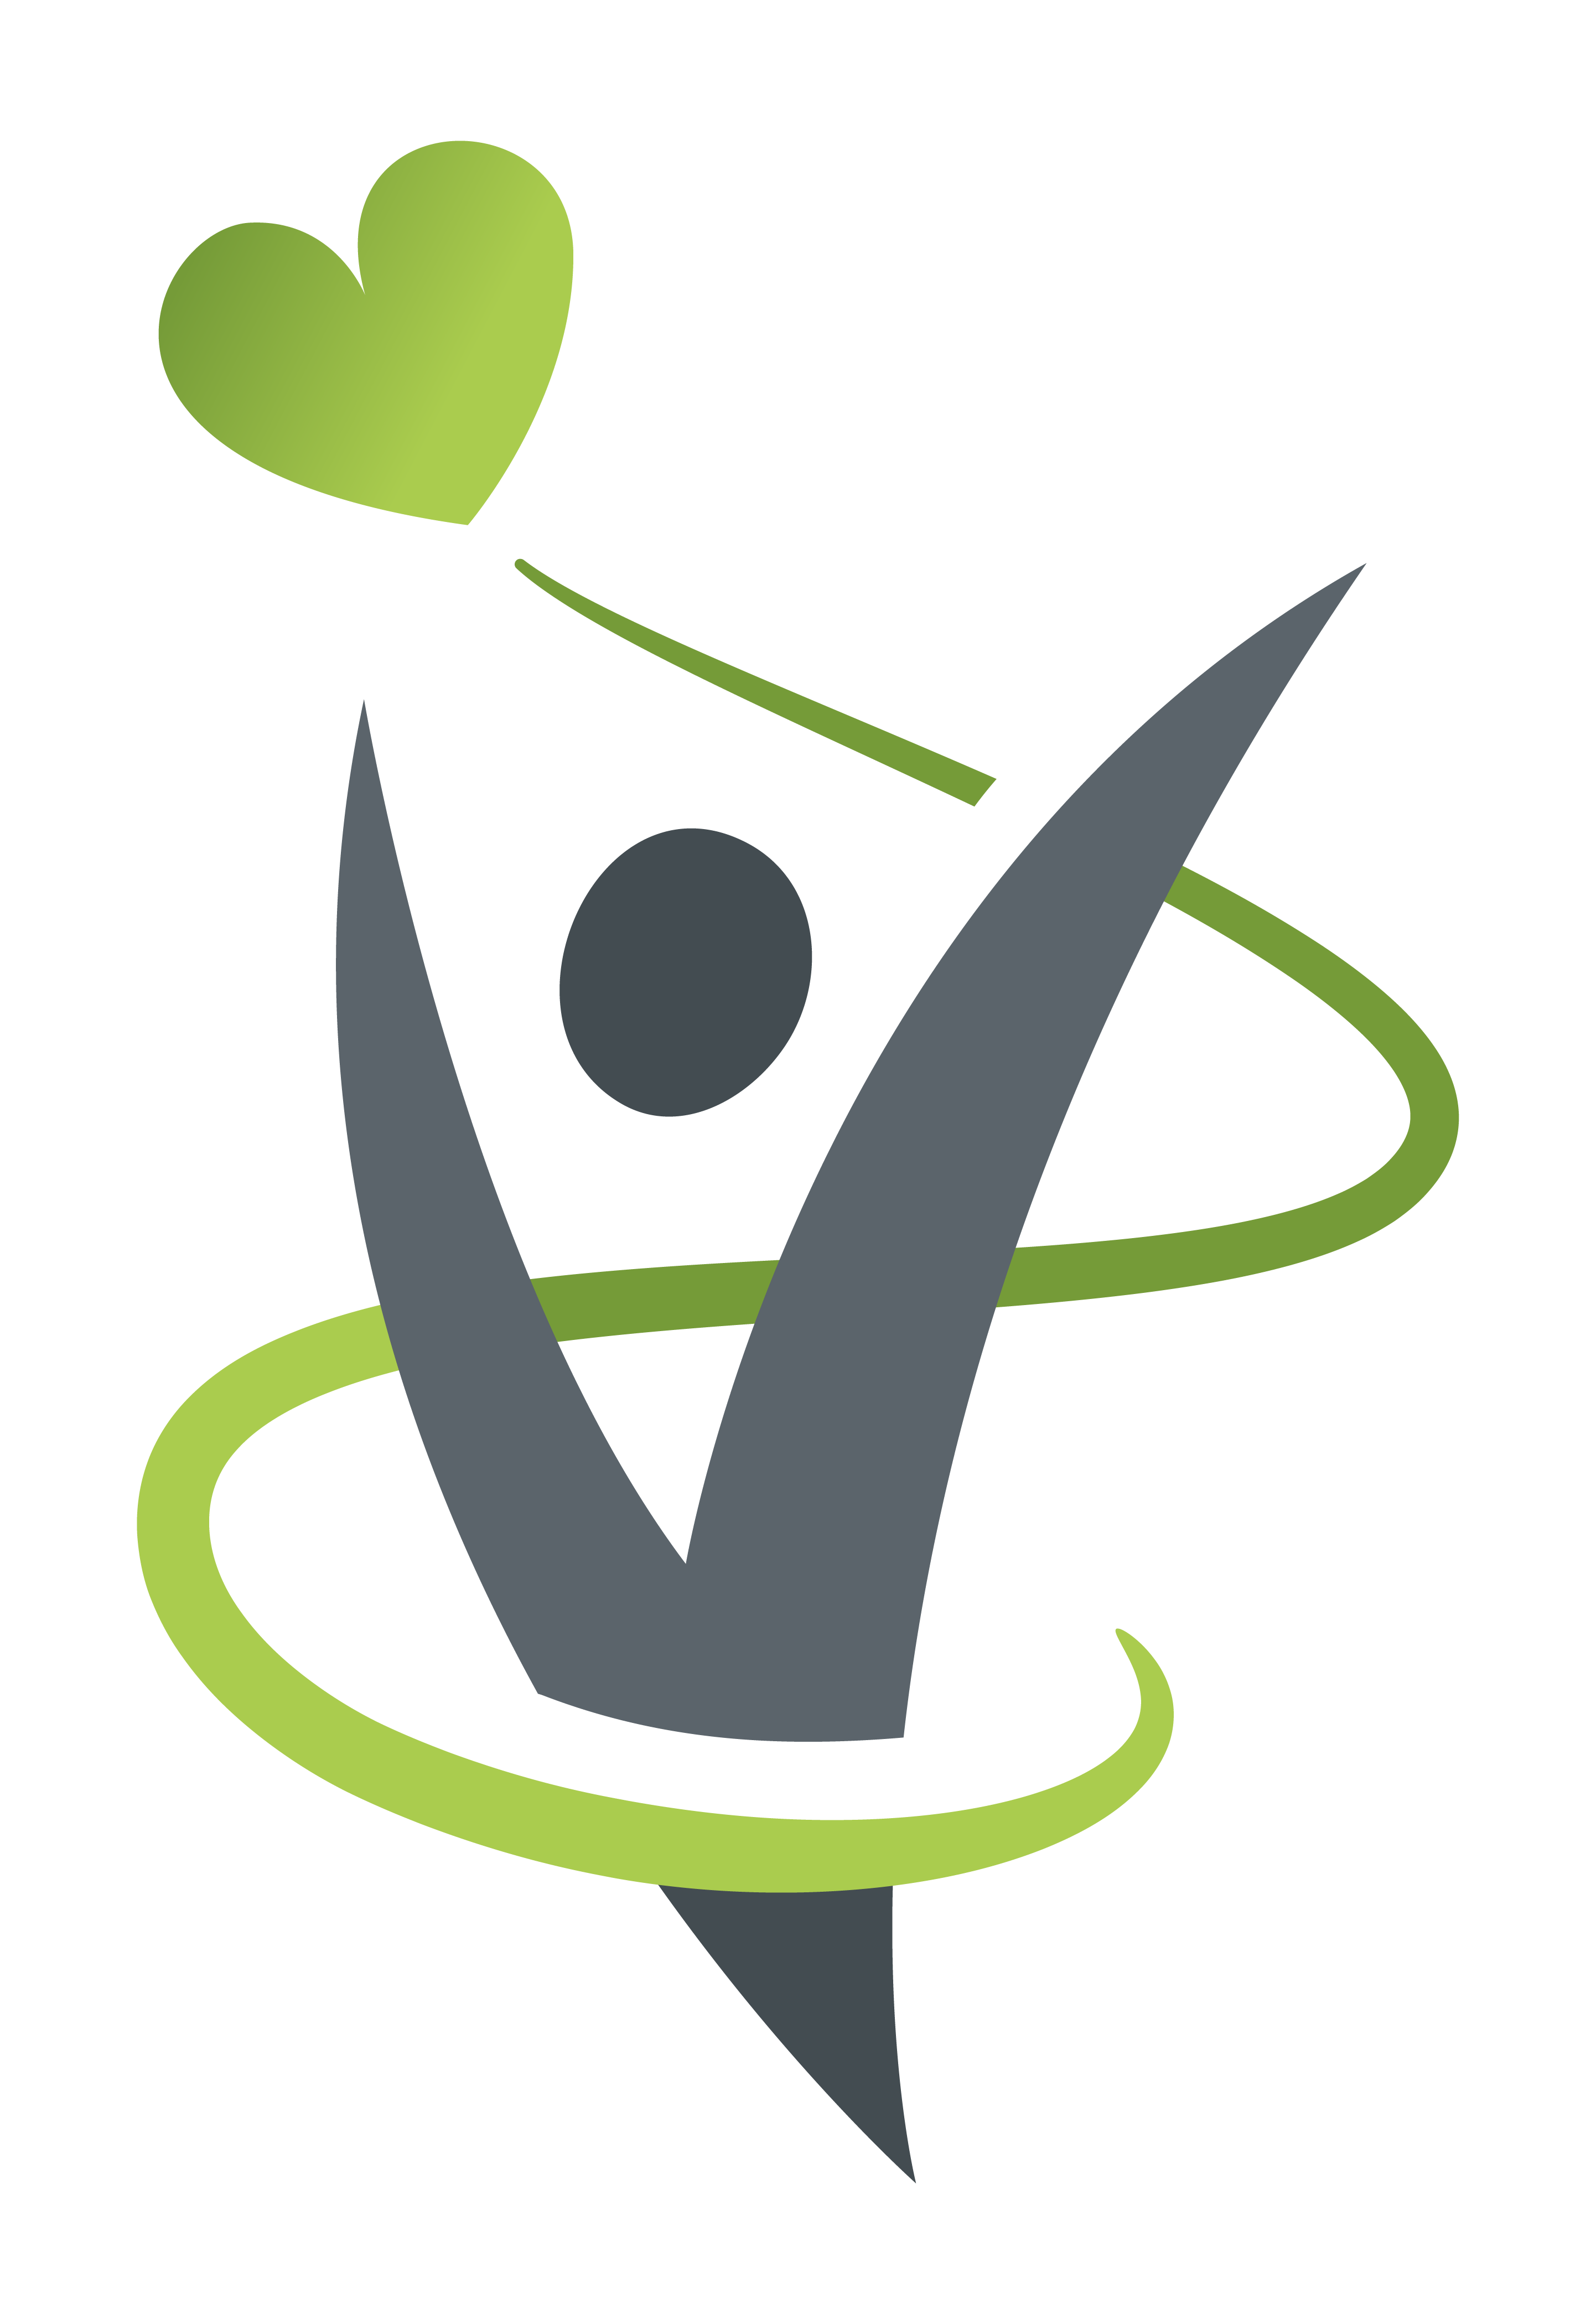 Looking for eyecatching, healthy joyful logo